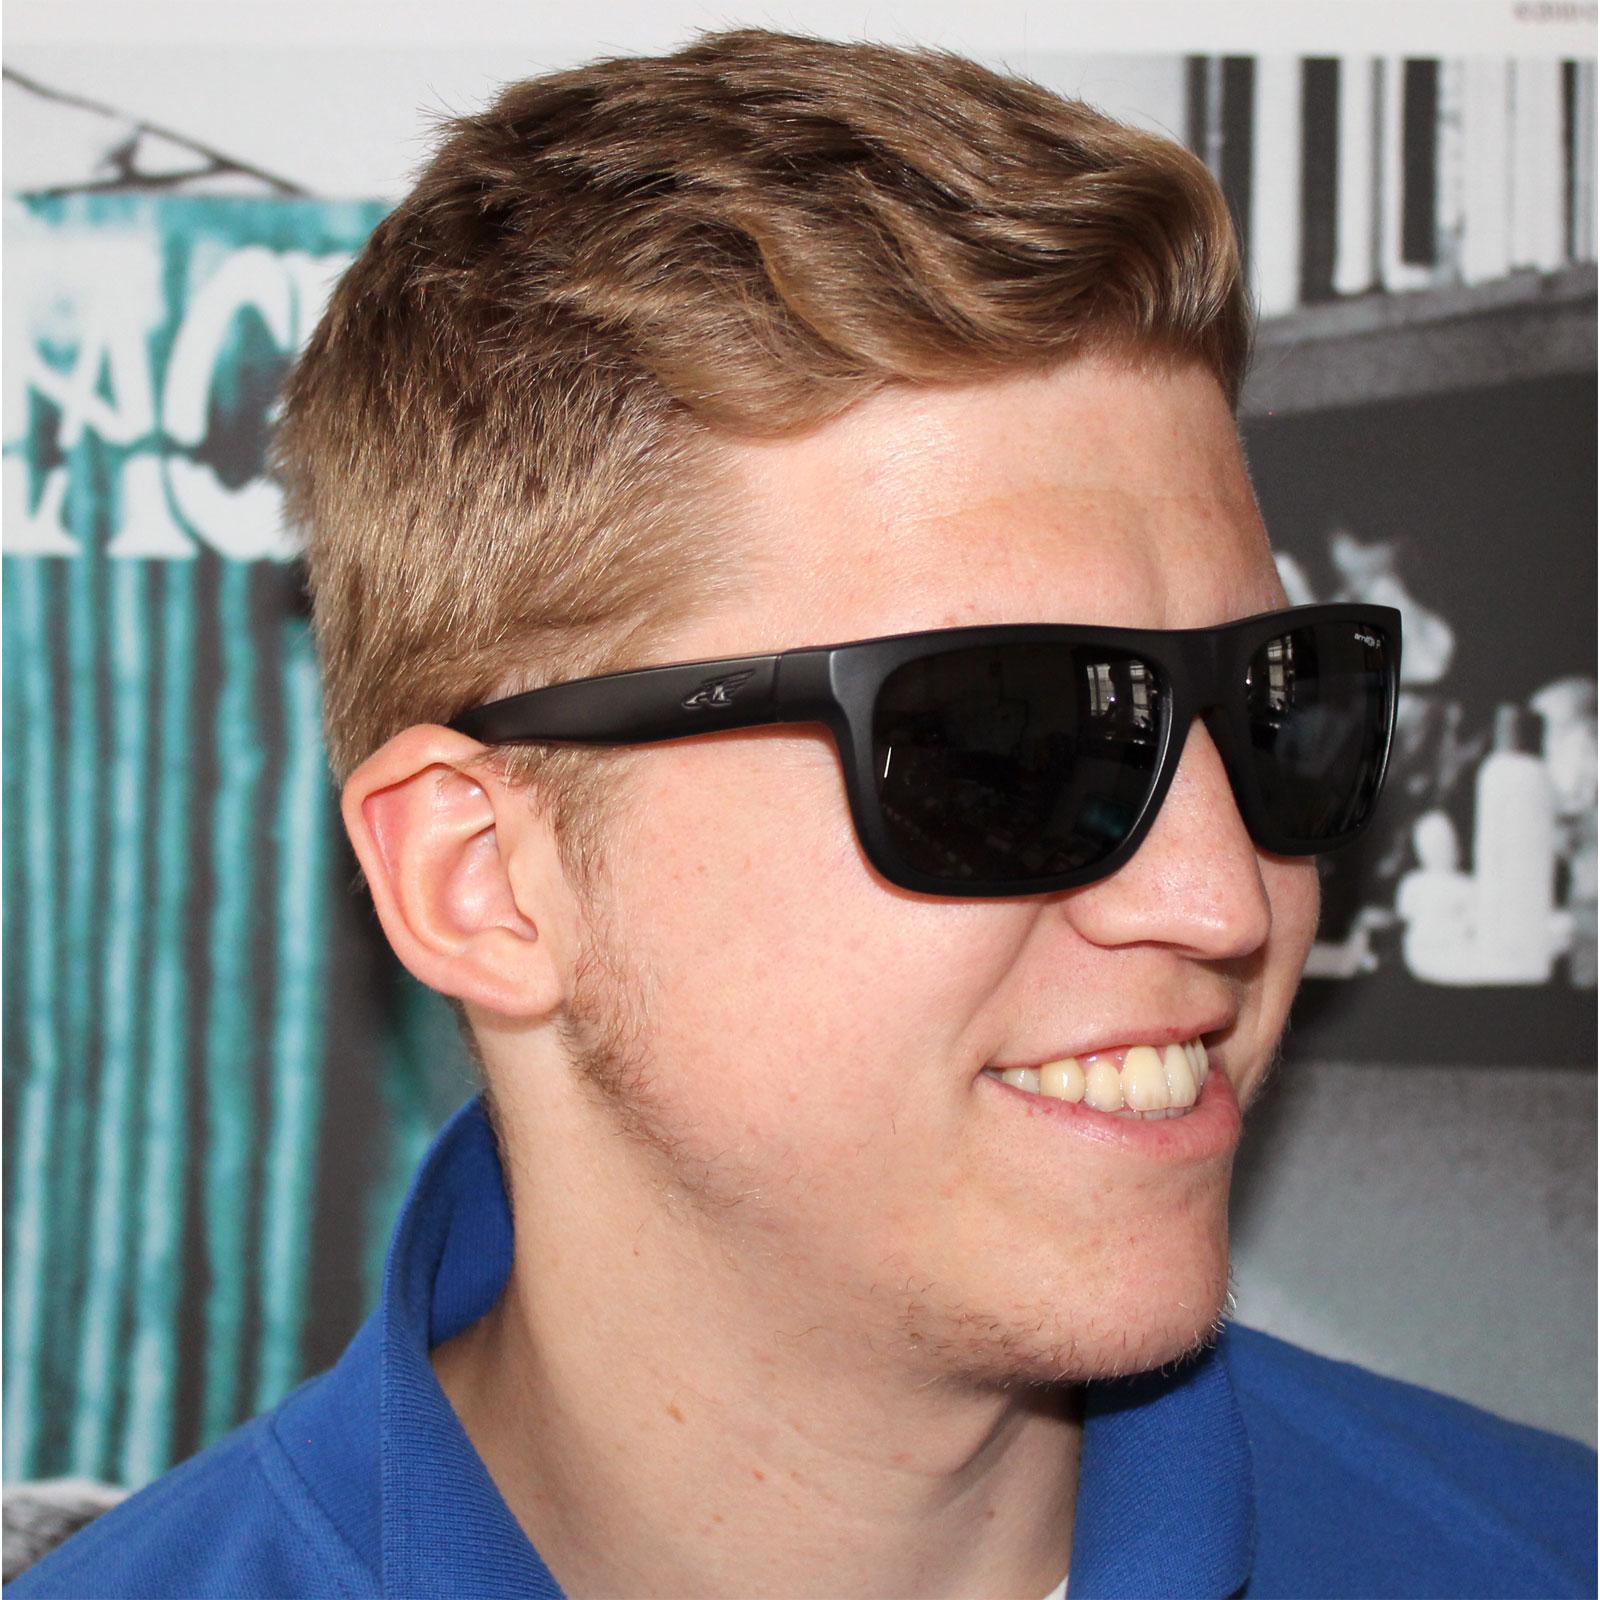 4f45f5bee22 Sentinel Arnette Sunglasses 4176 Dropout 222881 Matt Black Grey Polarized